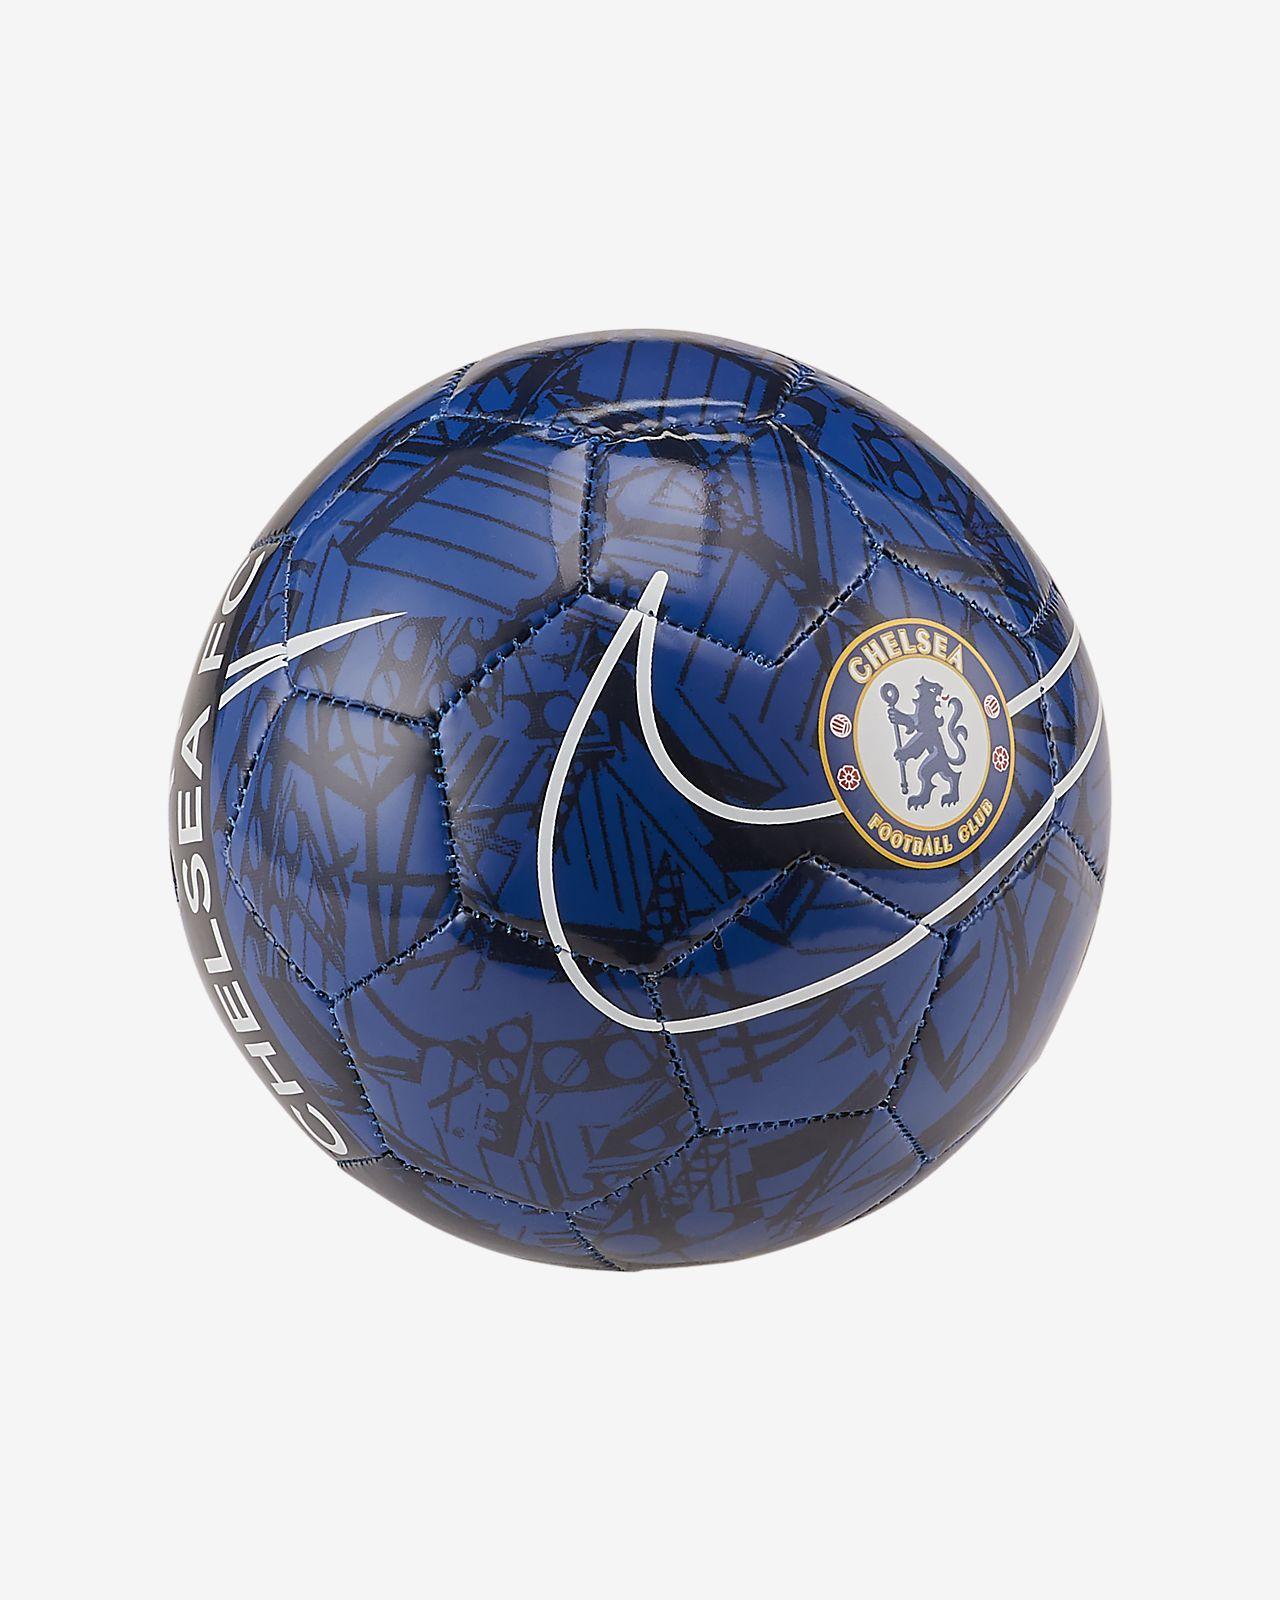 Chelsea FC Skills fotball